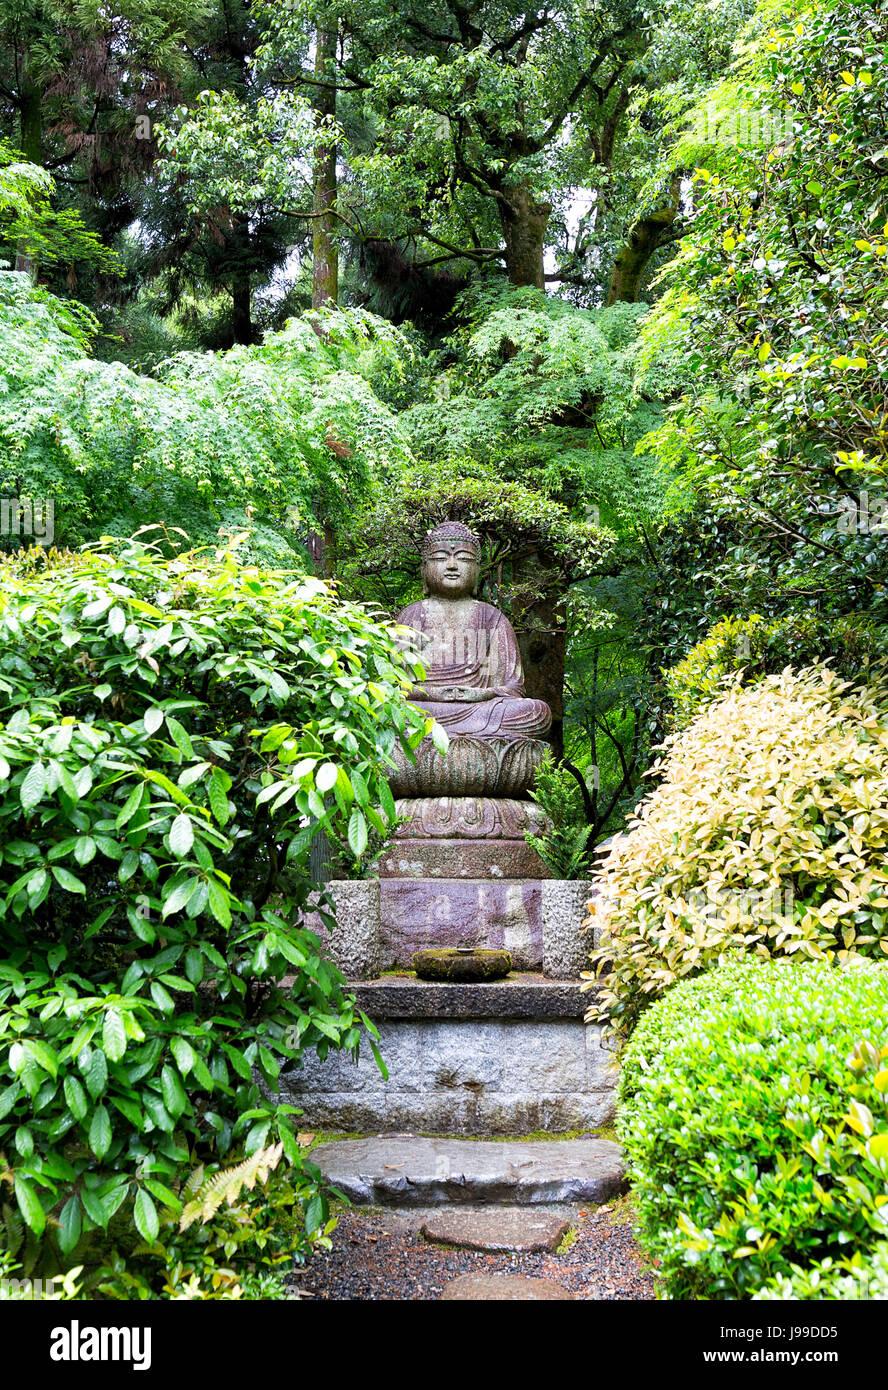 Statue of Buddha at Ryoan-ji temple in Kyoto Japan - Stock Image